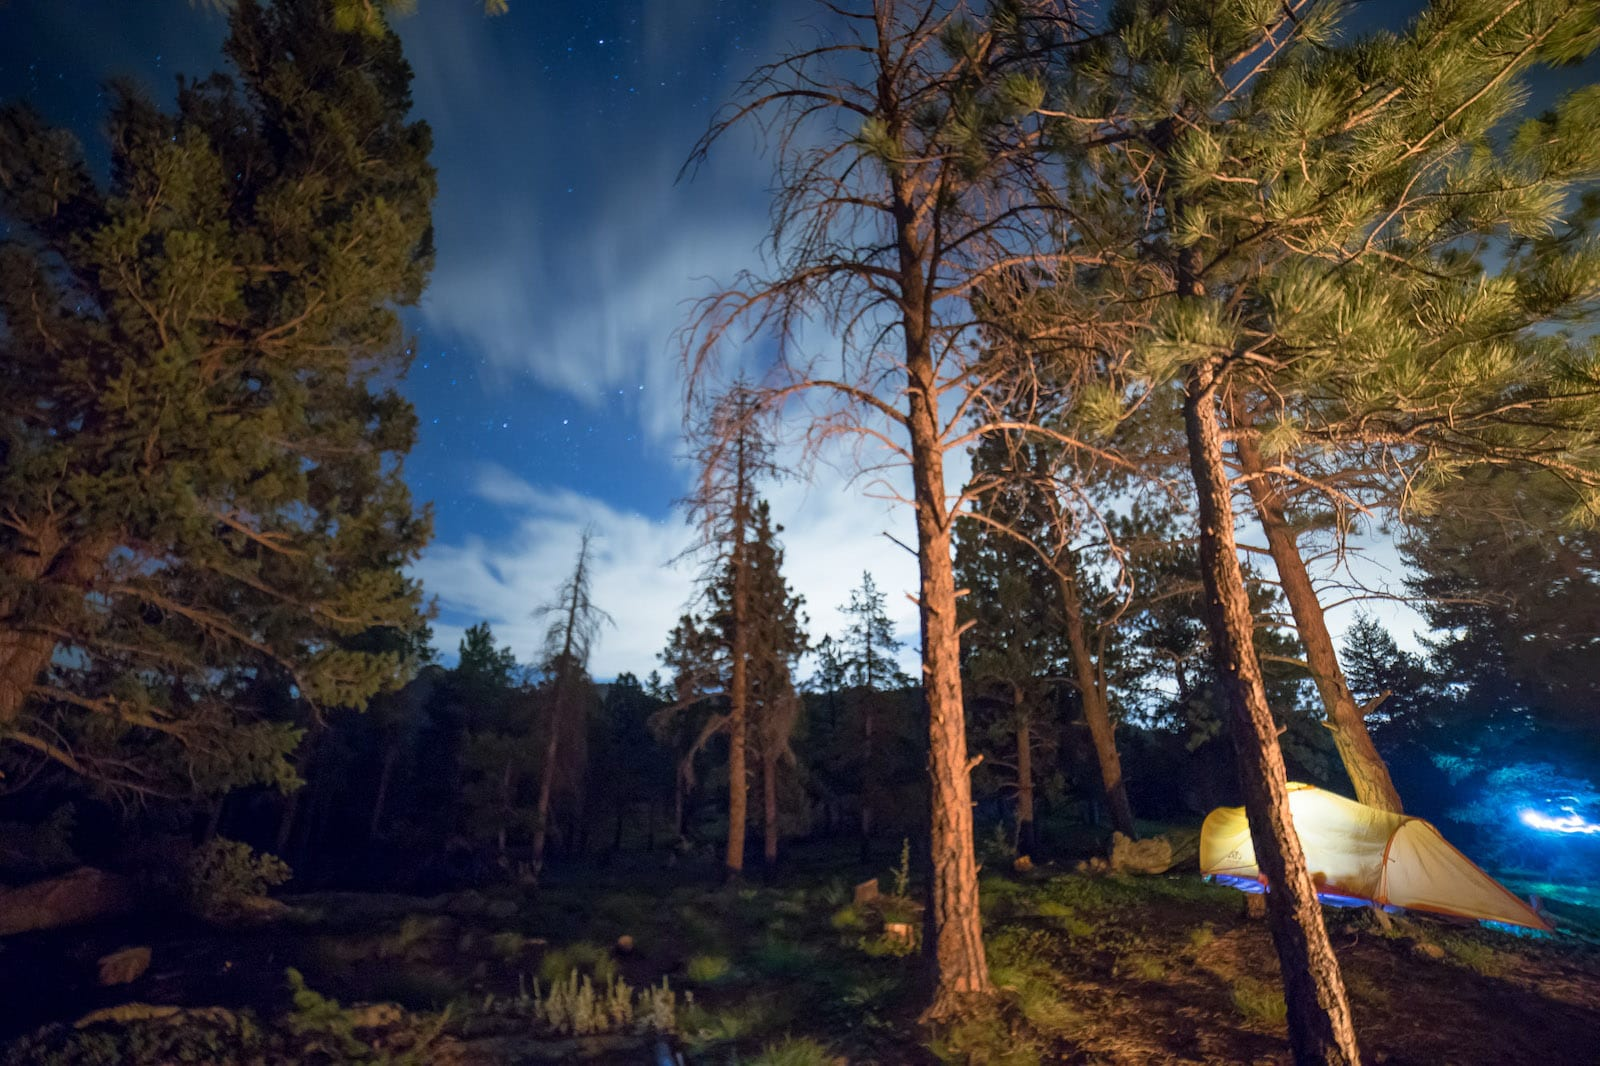 Gross Reservoir Tent Camping Boulder Colorado